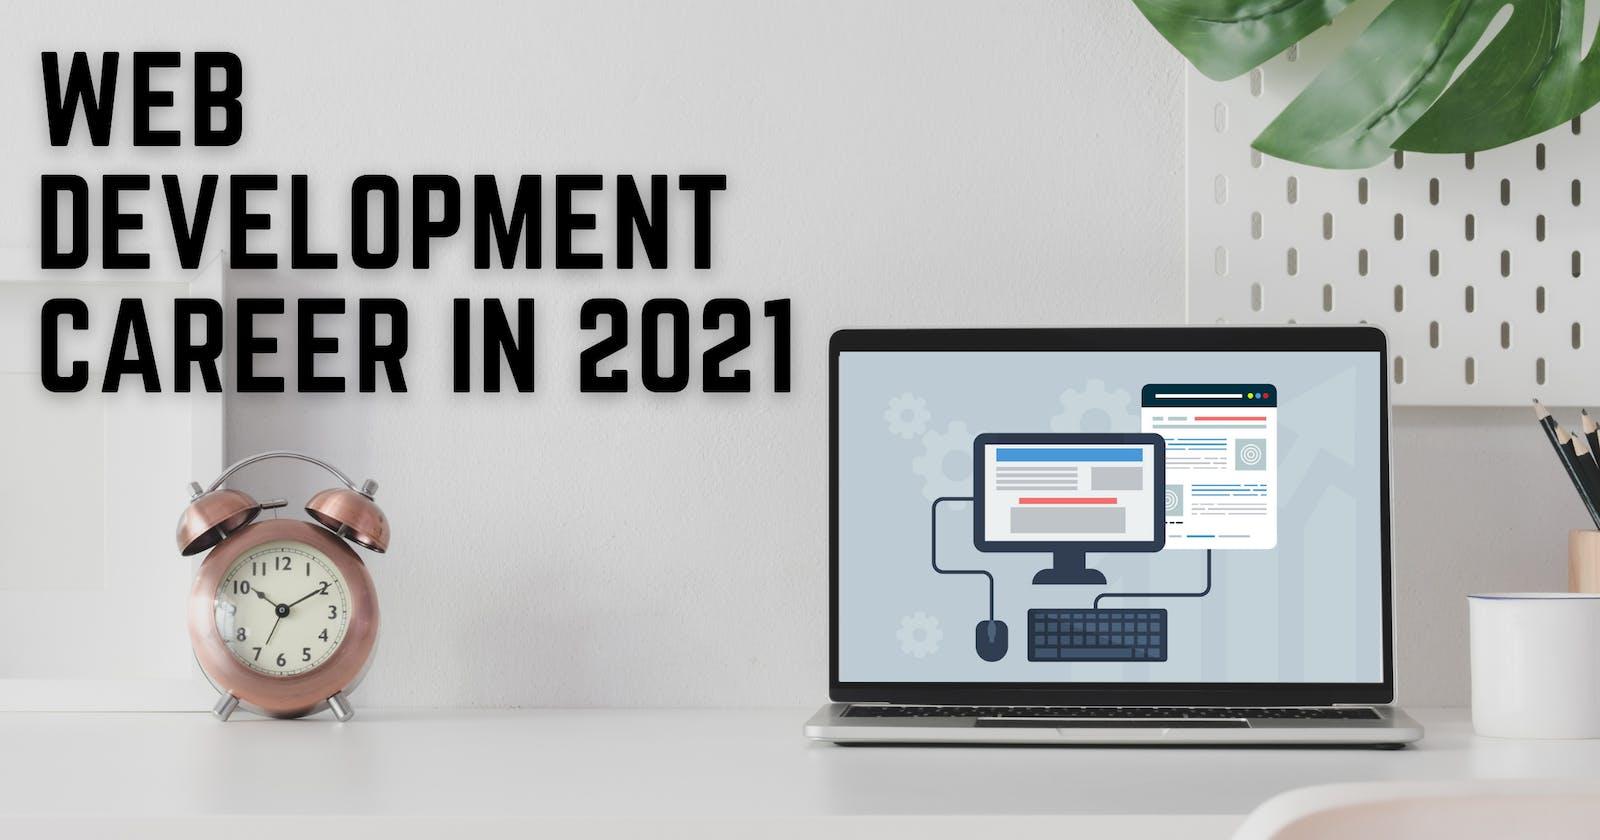 A career in web development in 2021